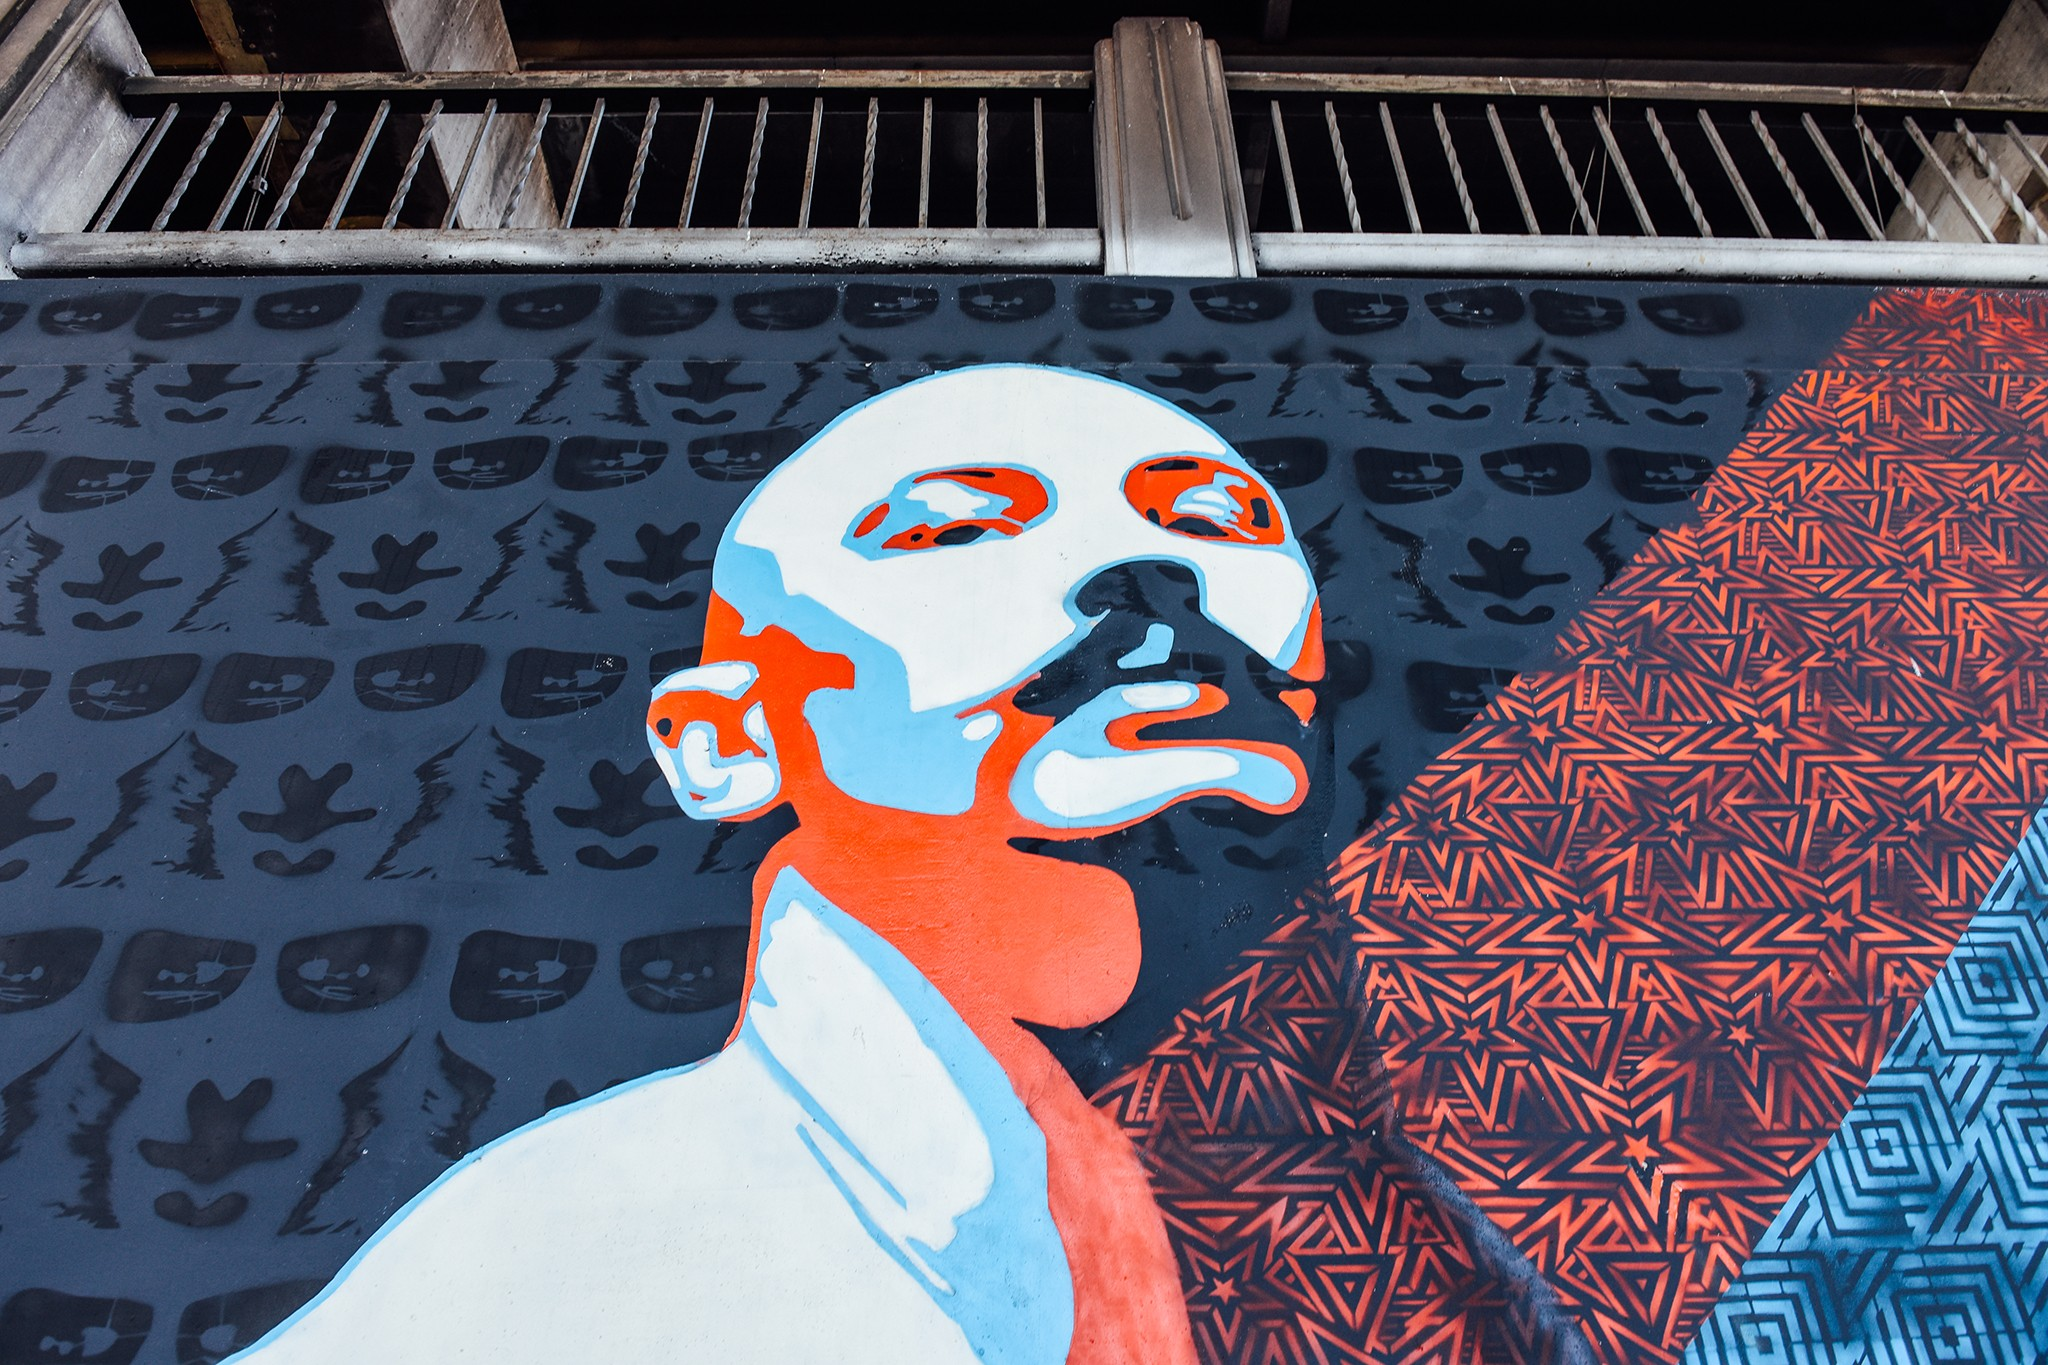 surj famous street artist